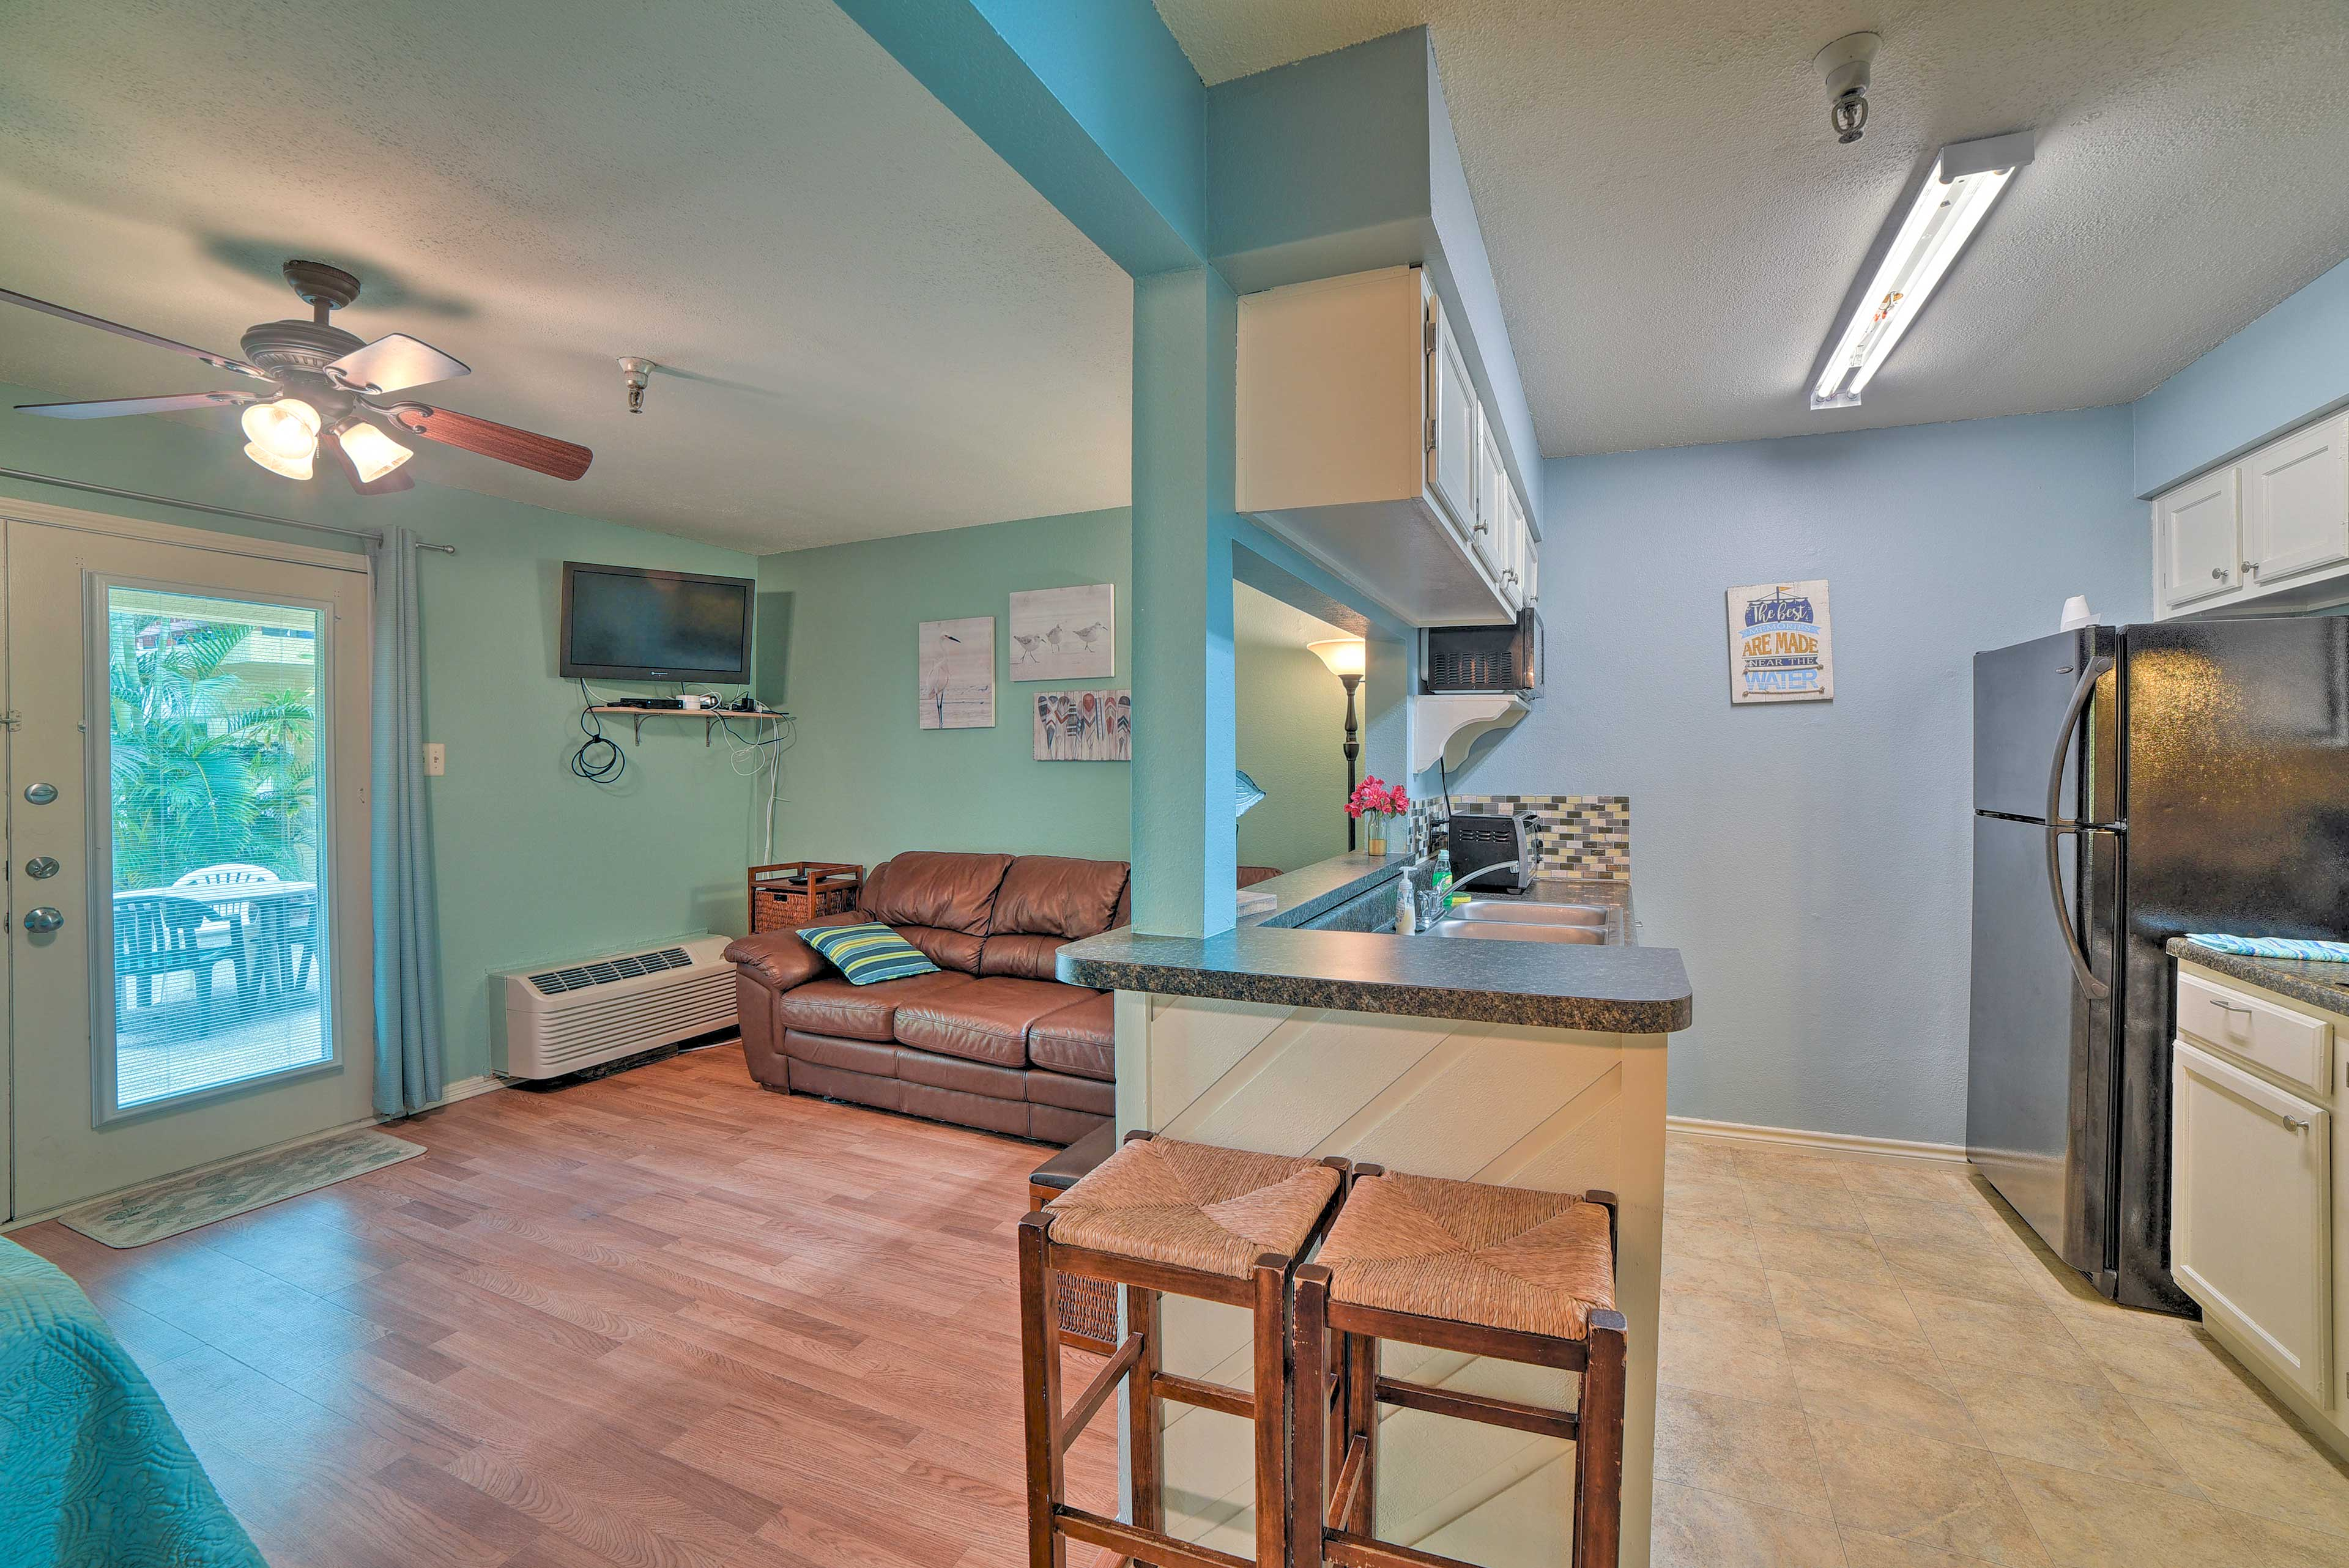 Corpus Christi Vacation Rental | 1BA | Private Entrance | Step-Free Access